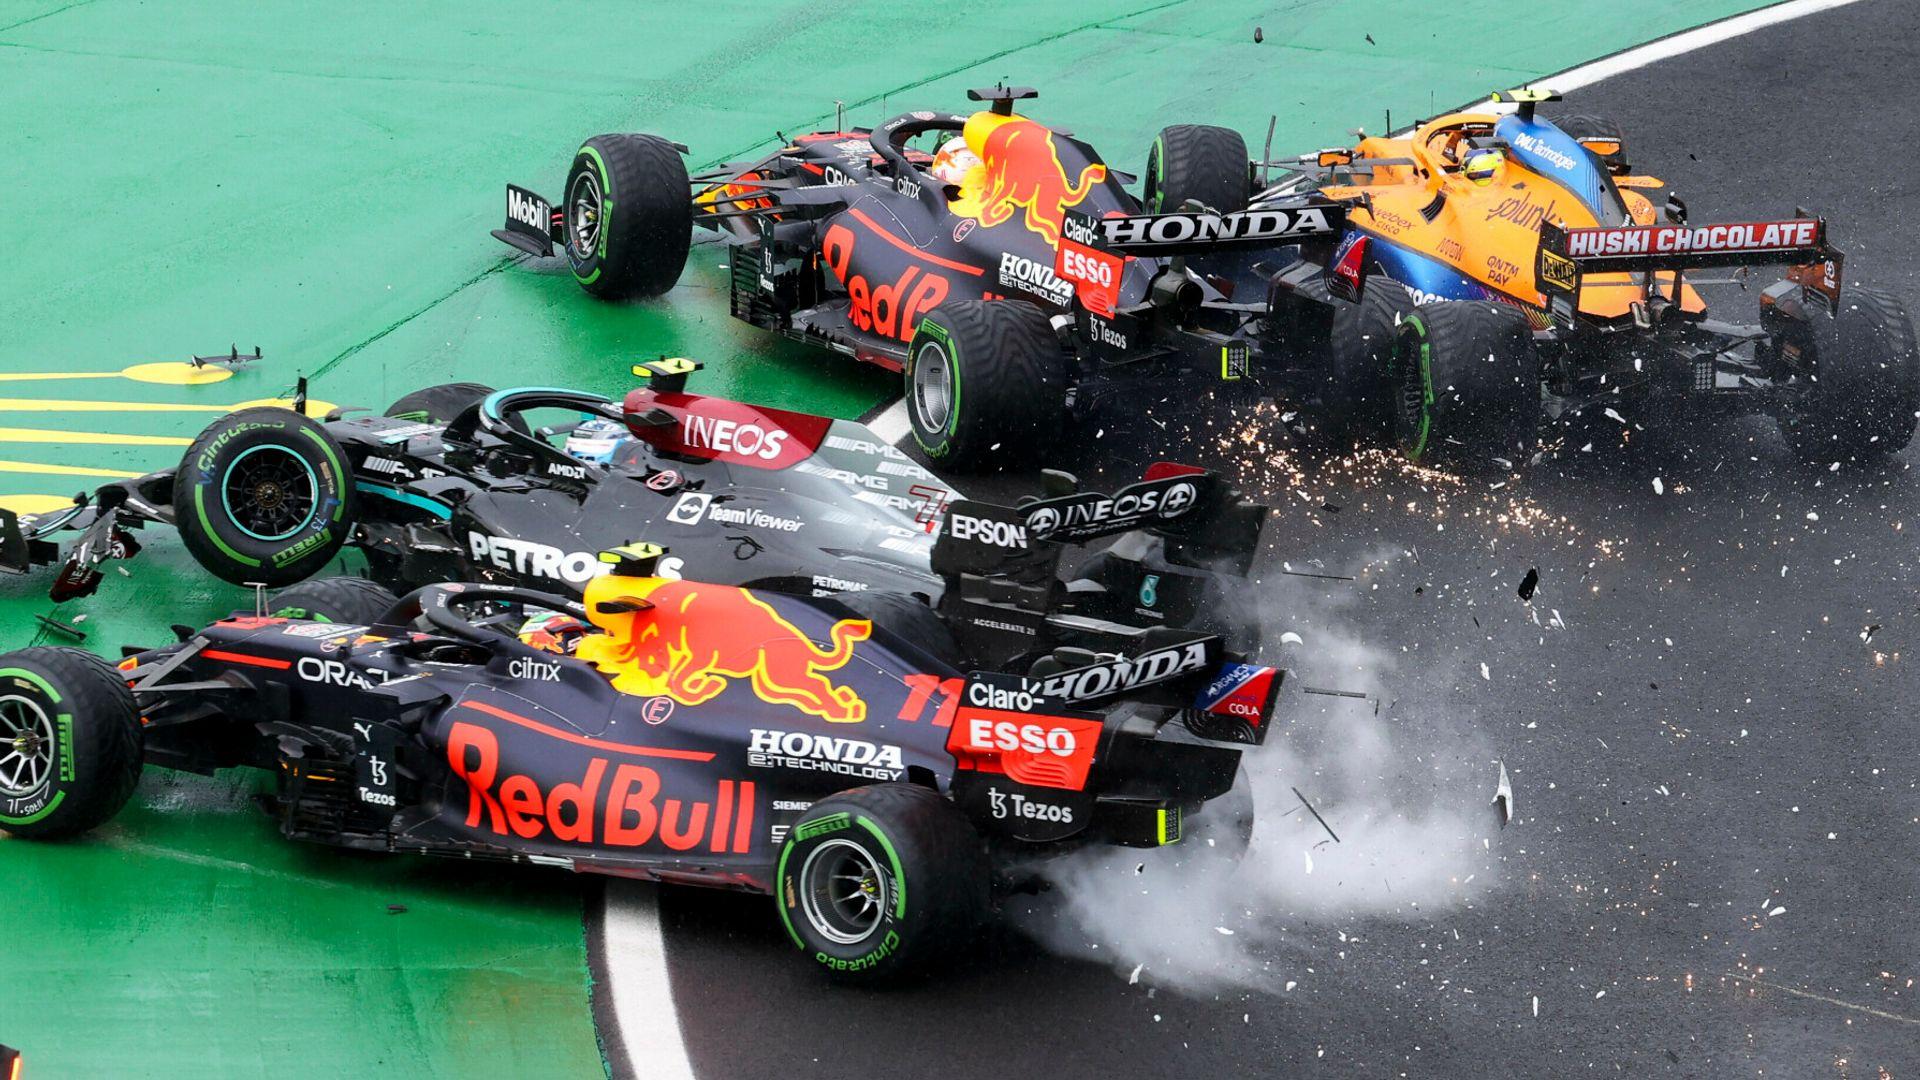 When's the next Formula 1 race?